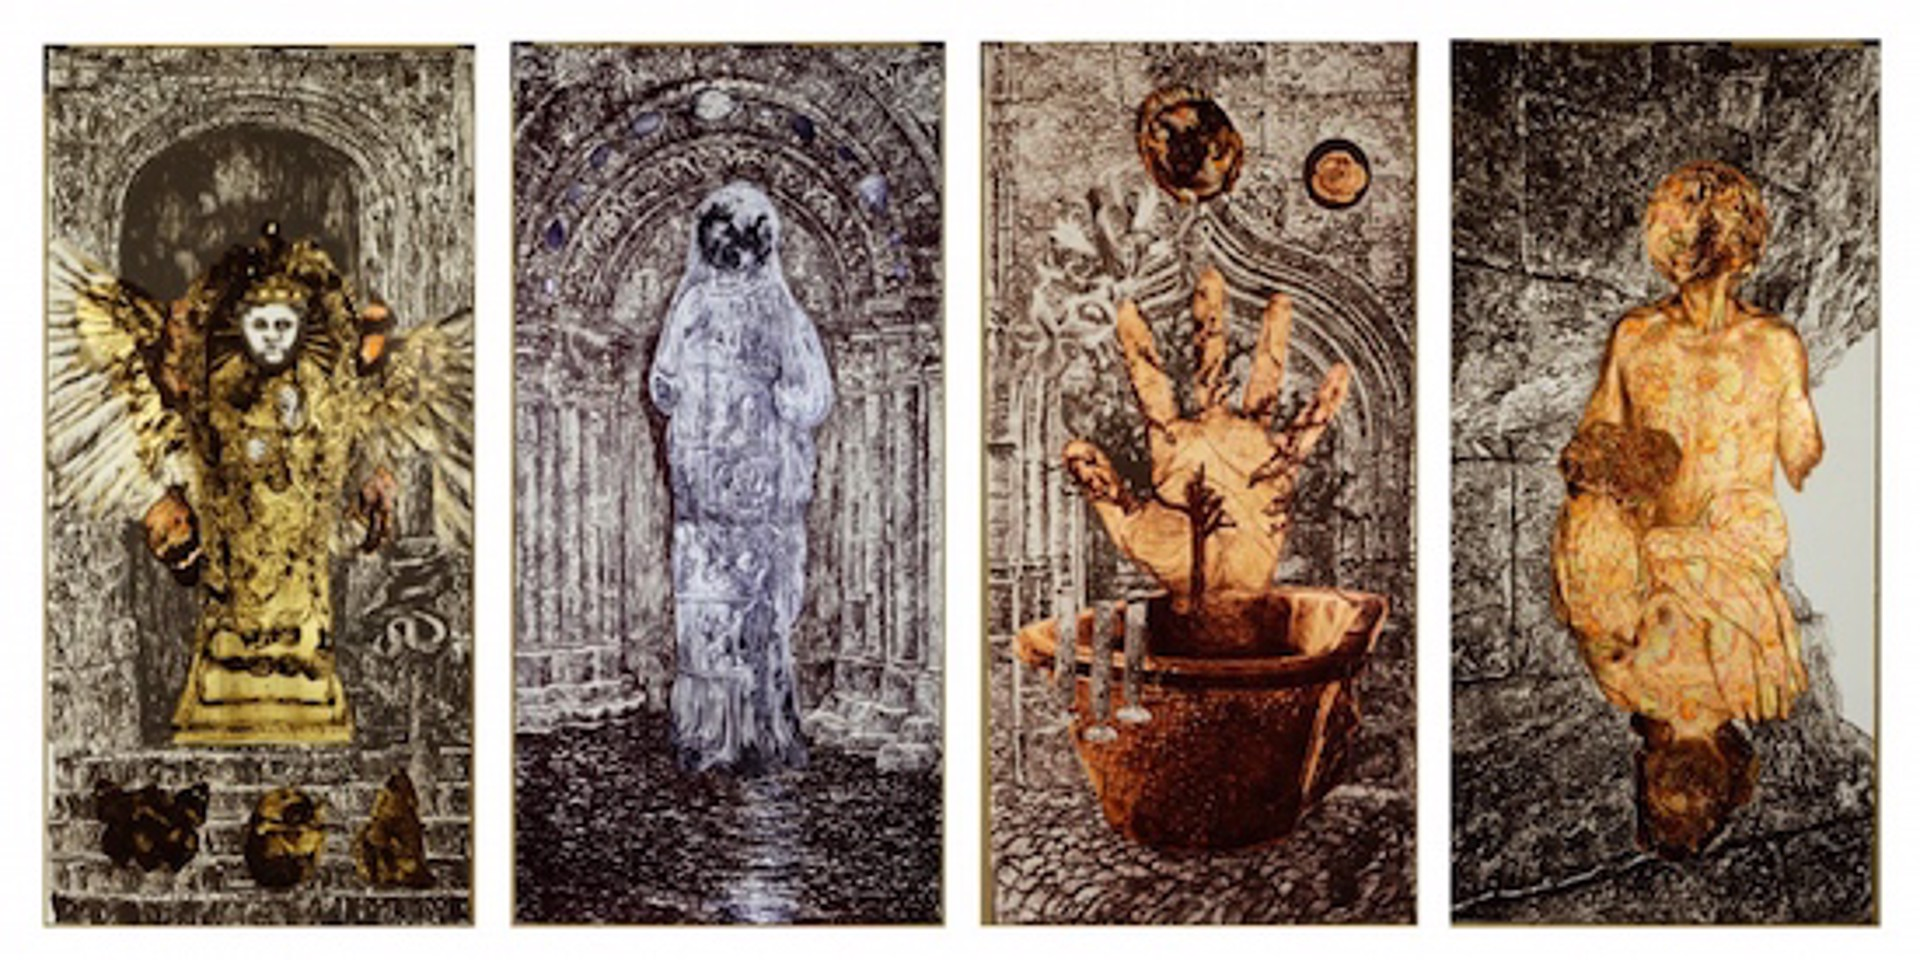 Alchemical Doors for C.A. Meier III (The Golden Child) by Ann McCoy